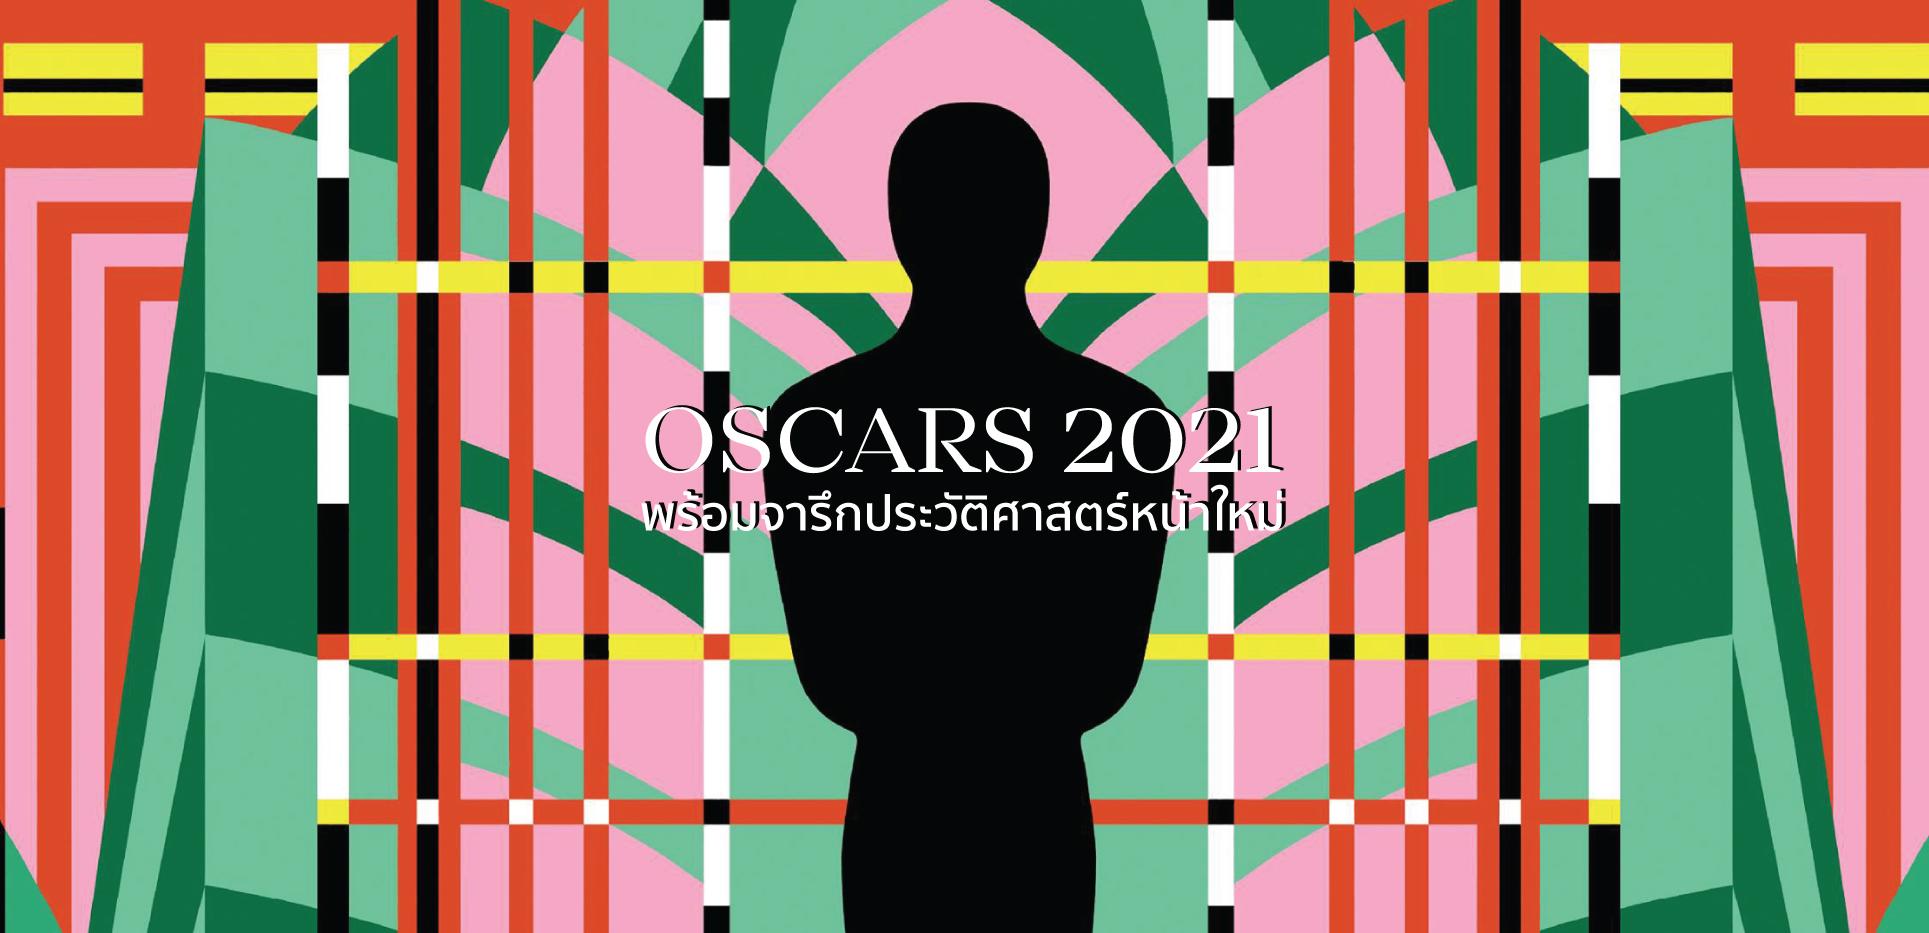 Oscars 2021 พร้อมจารึกประวัติศาสตร์หน้าใหม่